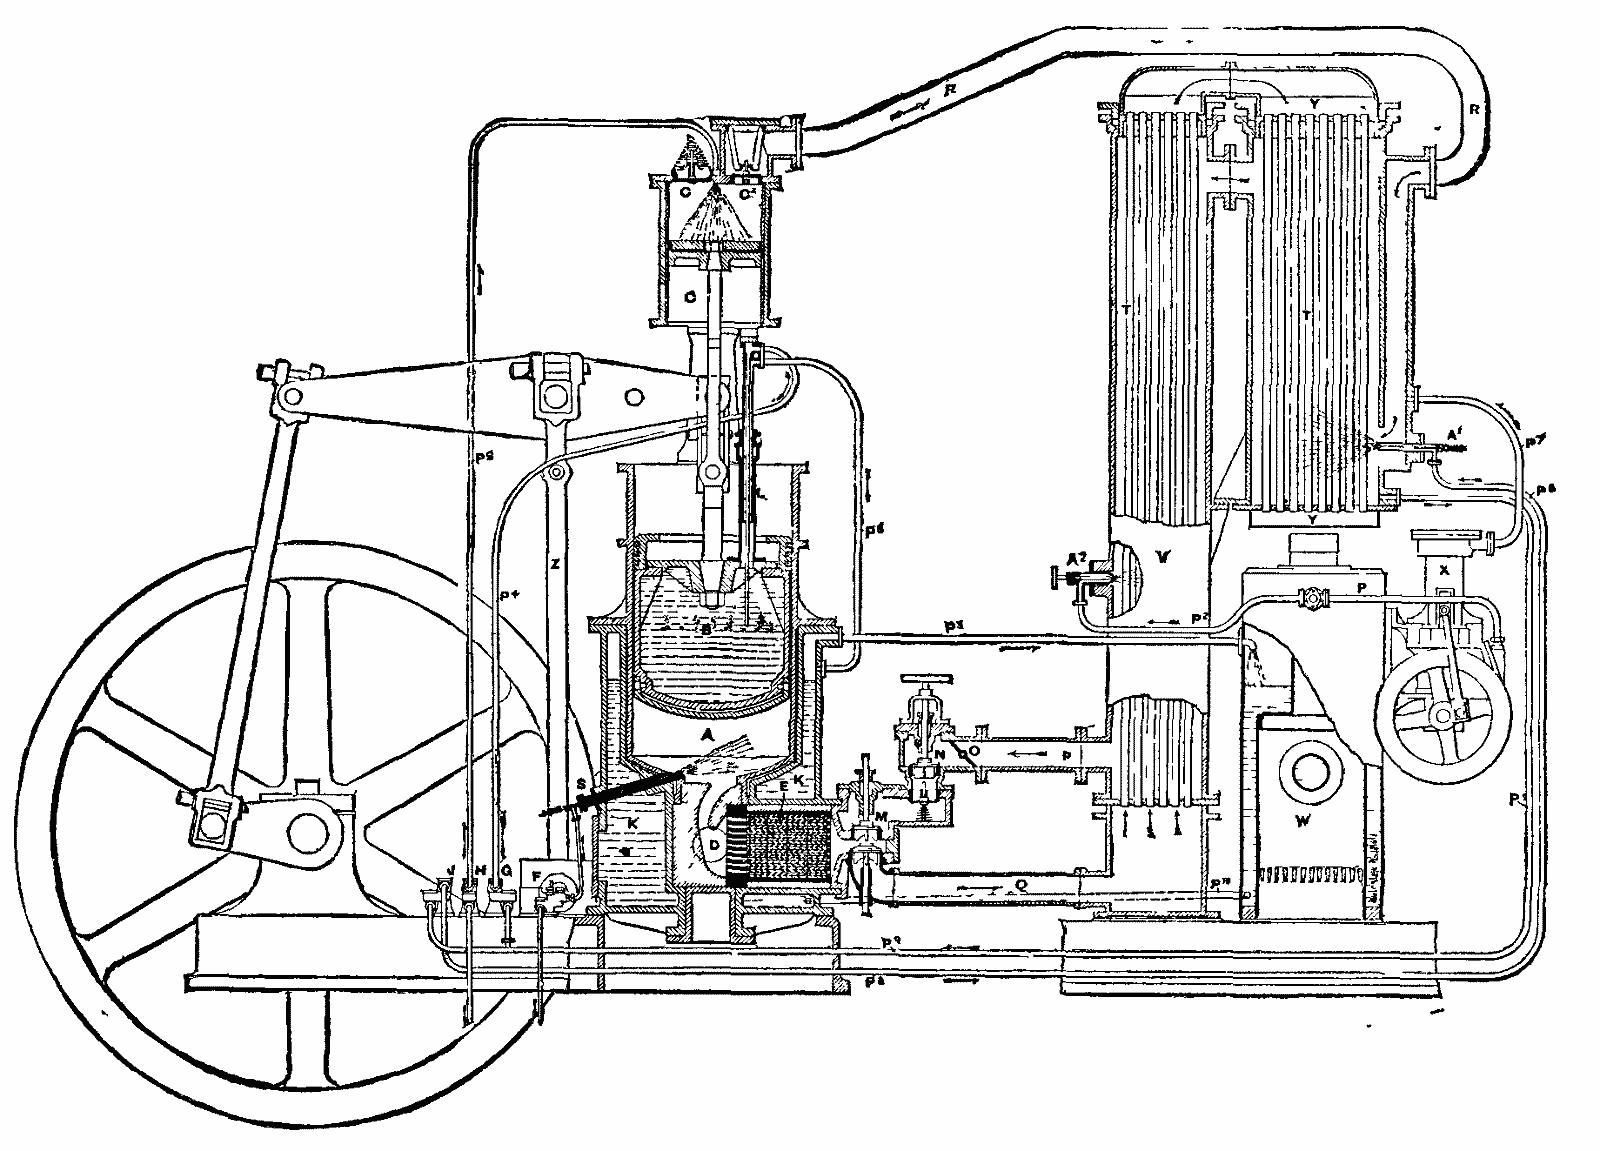 Vacuum Parts Diagram Likewise South Bend Lathe Motor Wiring Diagram